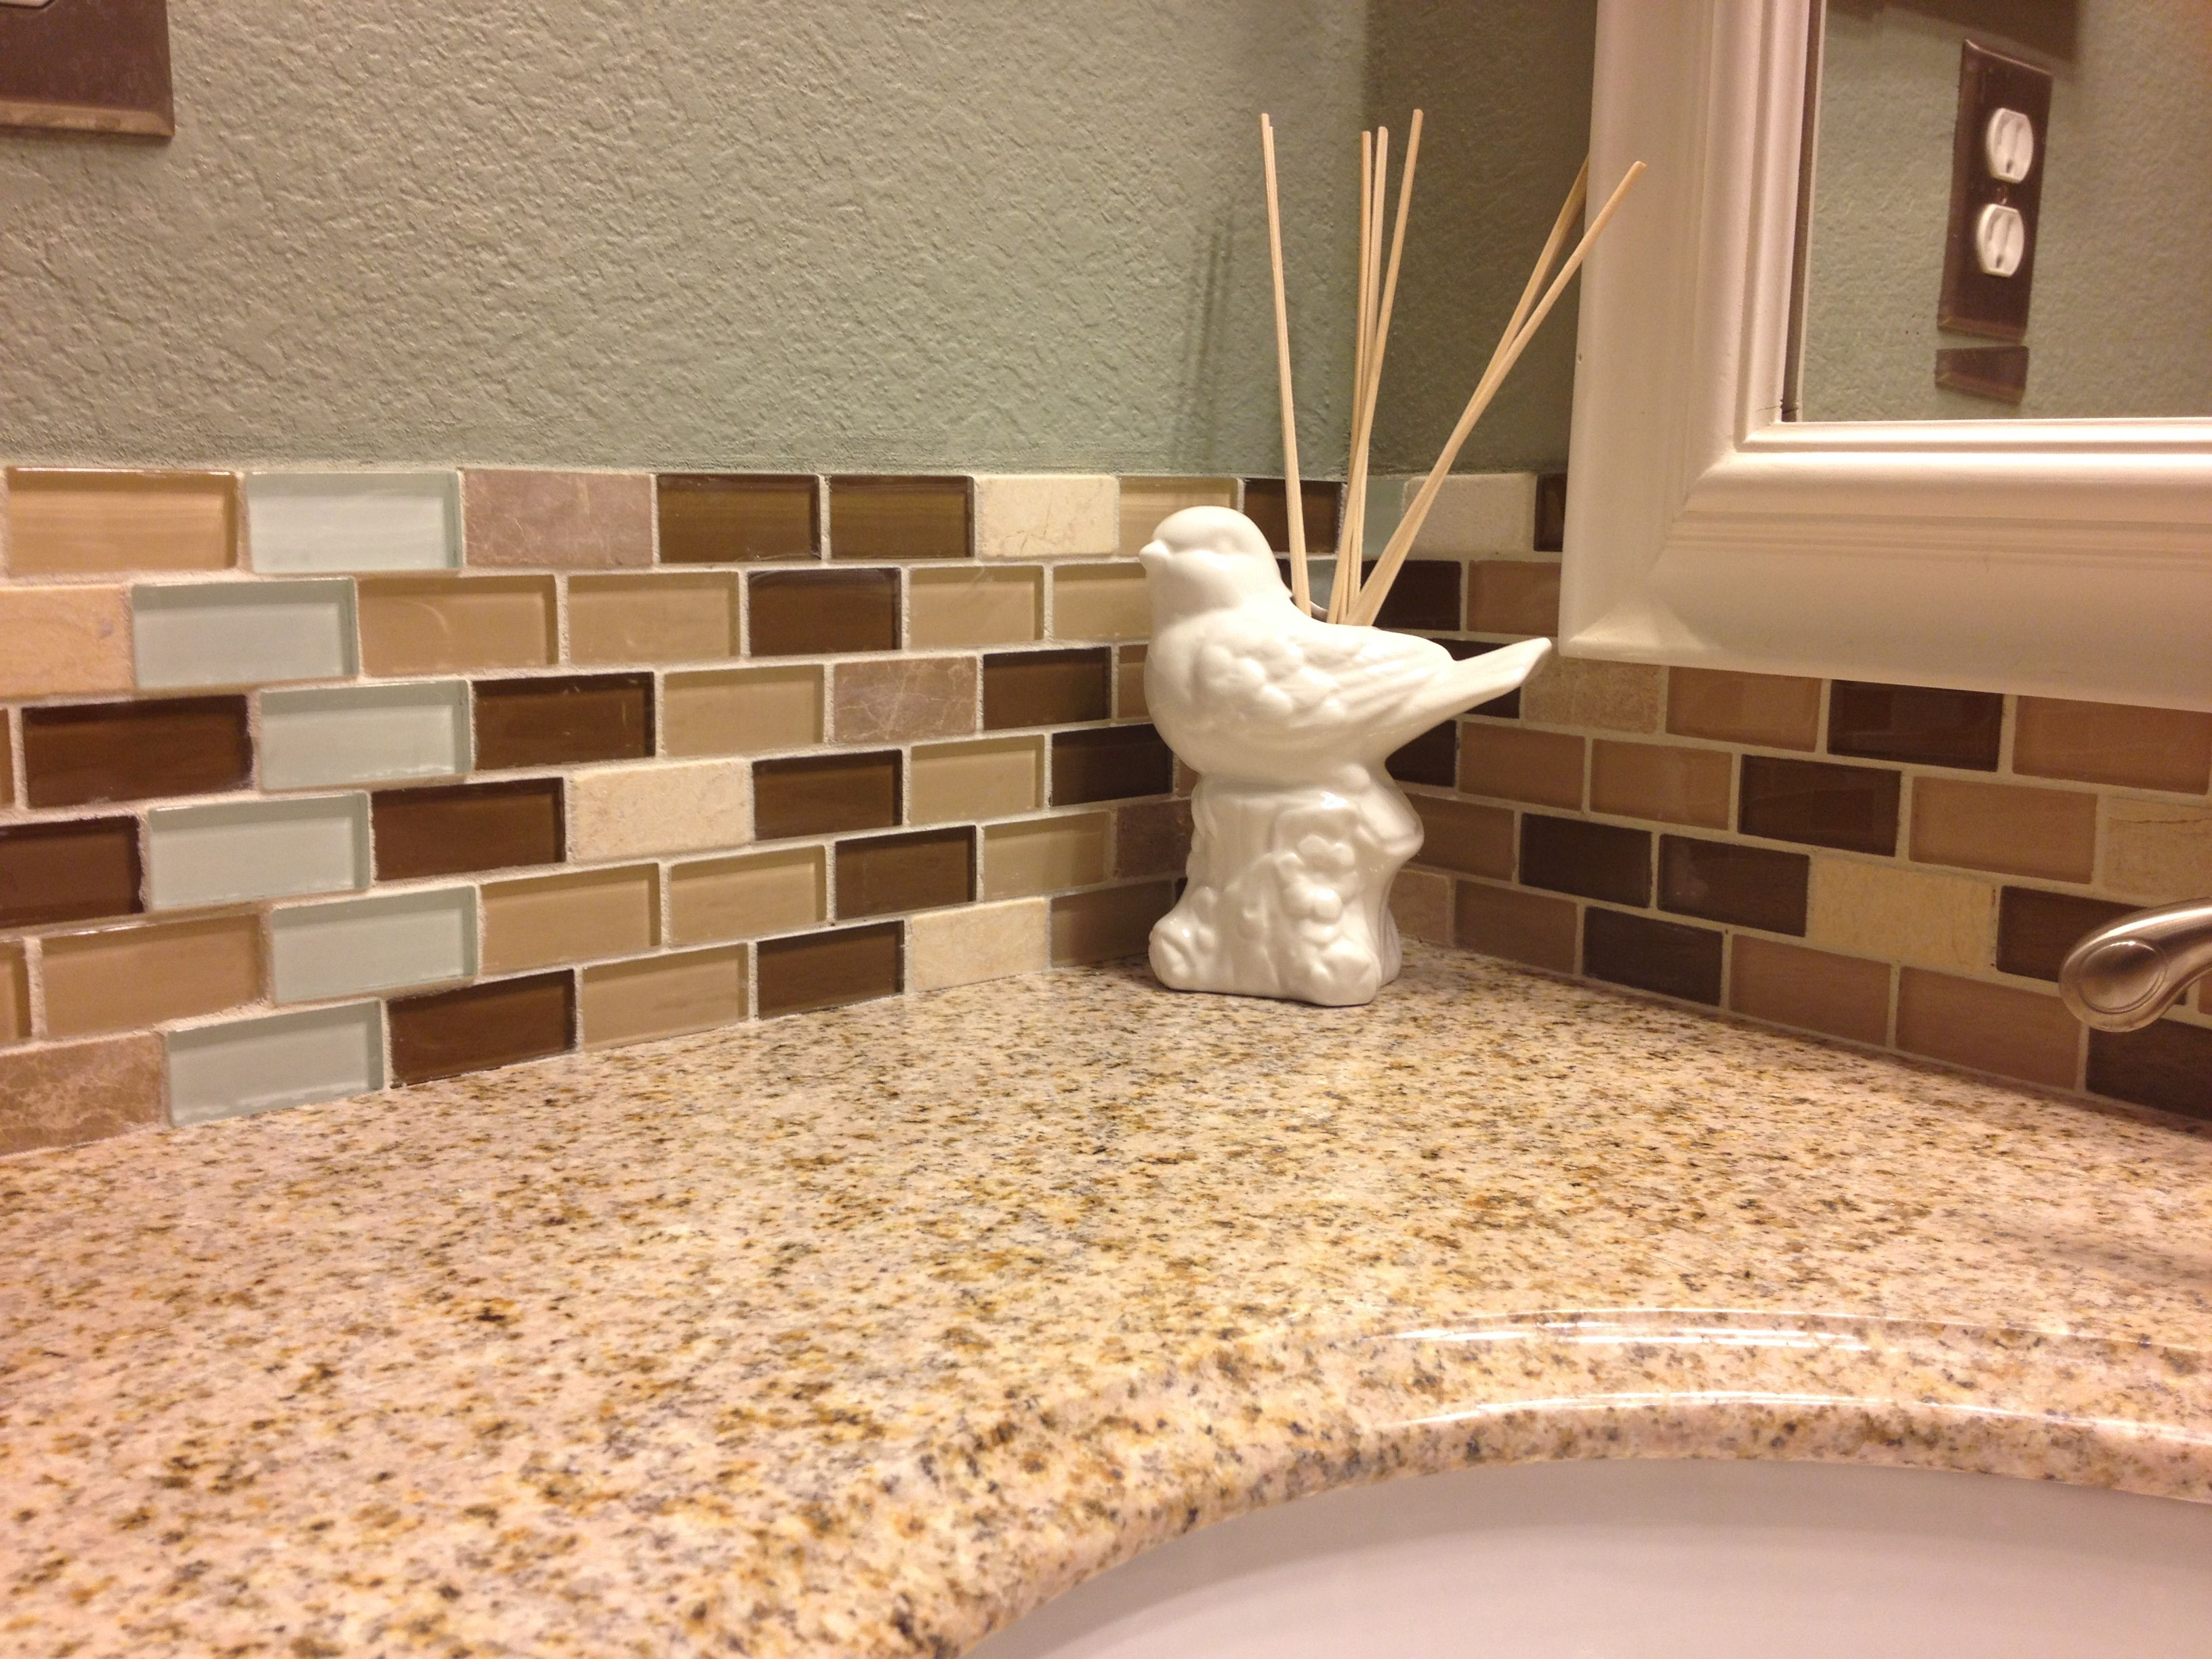 Bathroom tile backsplash, slightly wraps the mirror | Deco ...